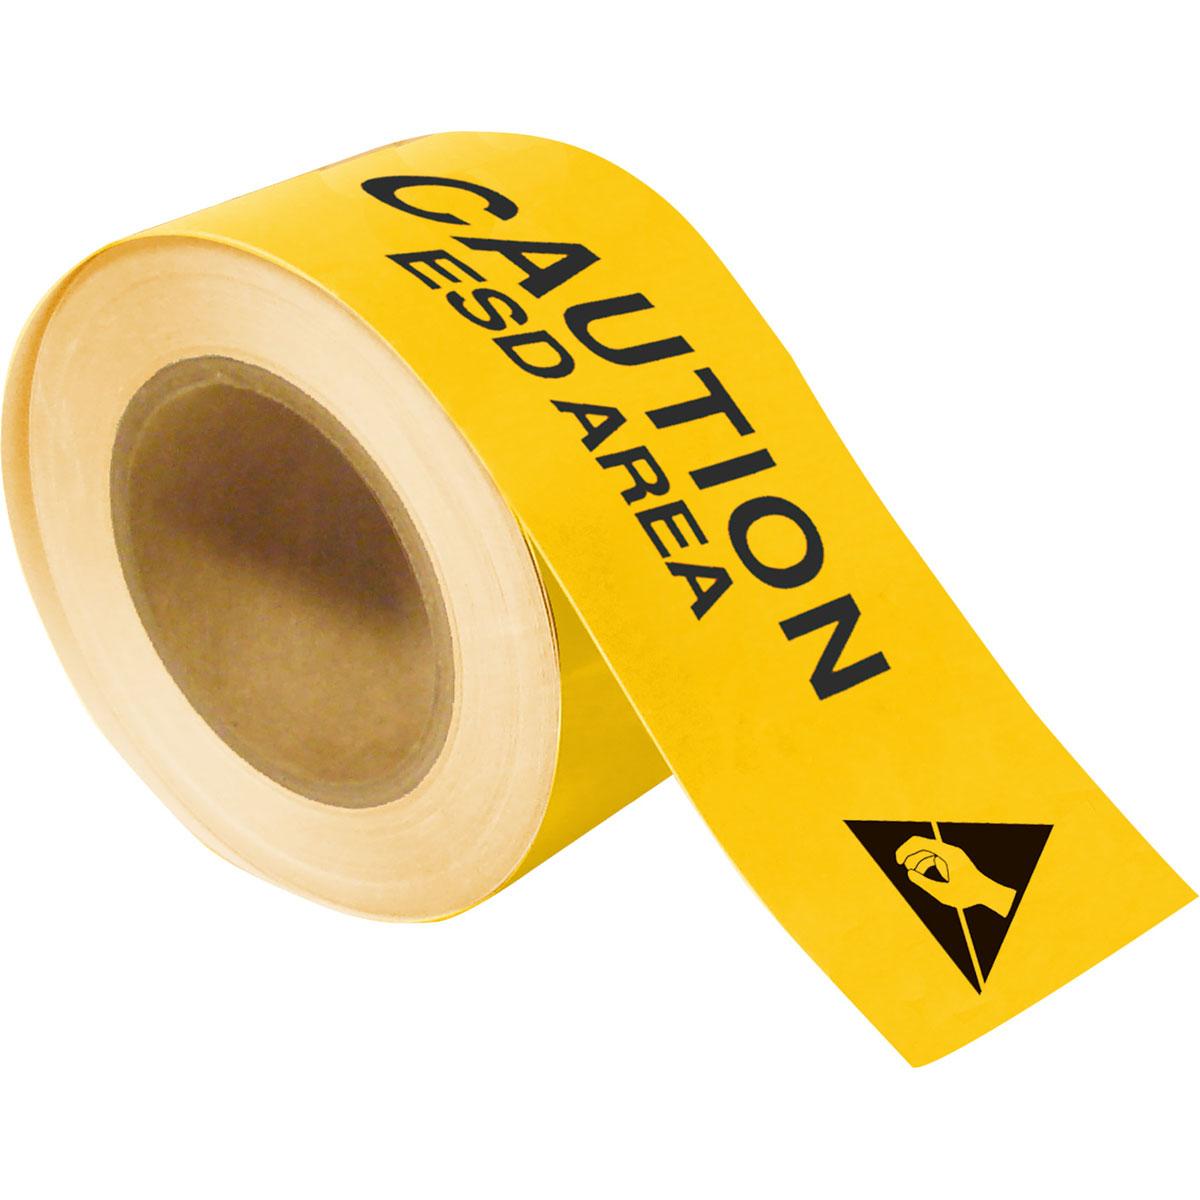 Brady Part: 121368 | ToughStripe CAUTION ESD AREA Floor Tape | BradyID.com